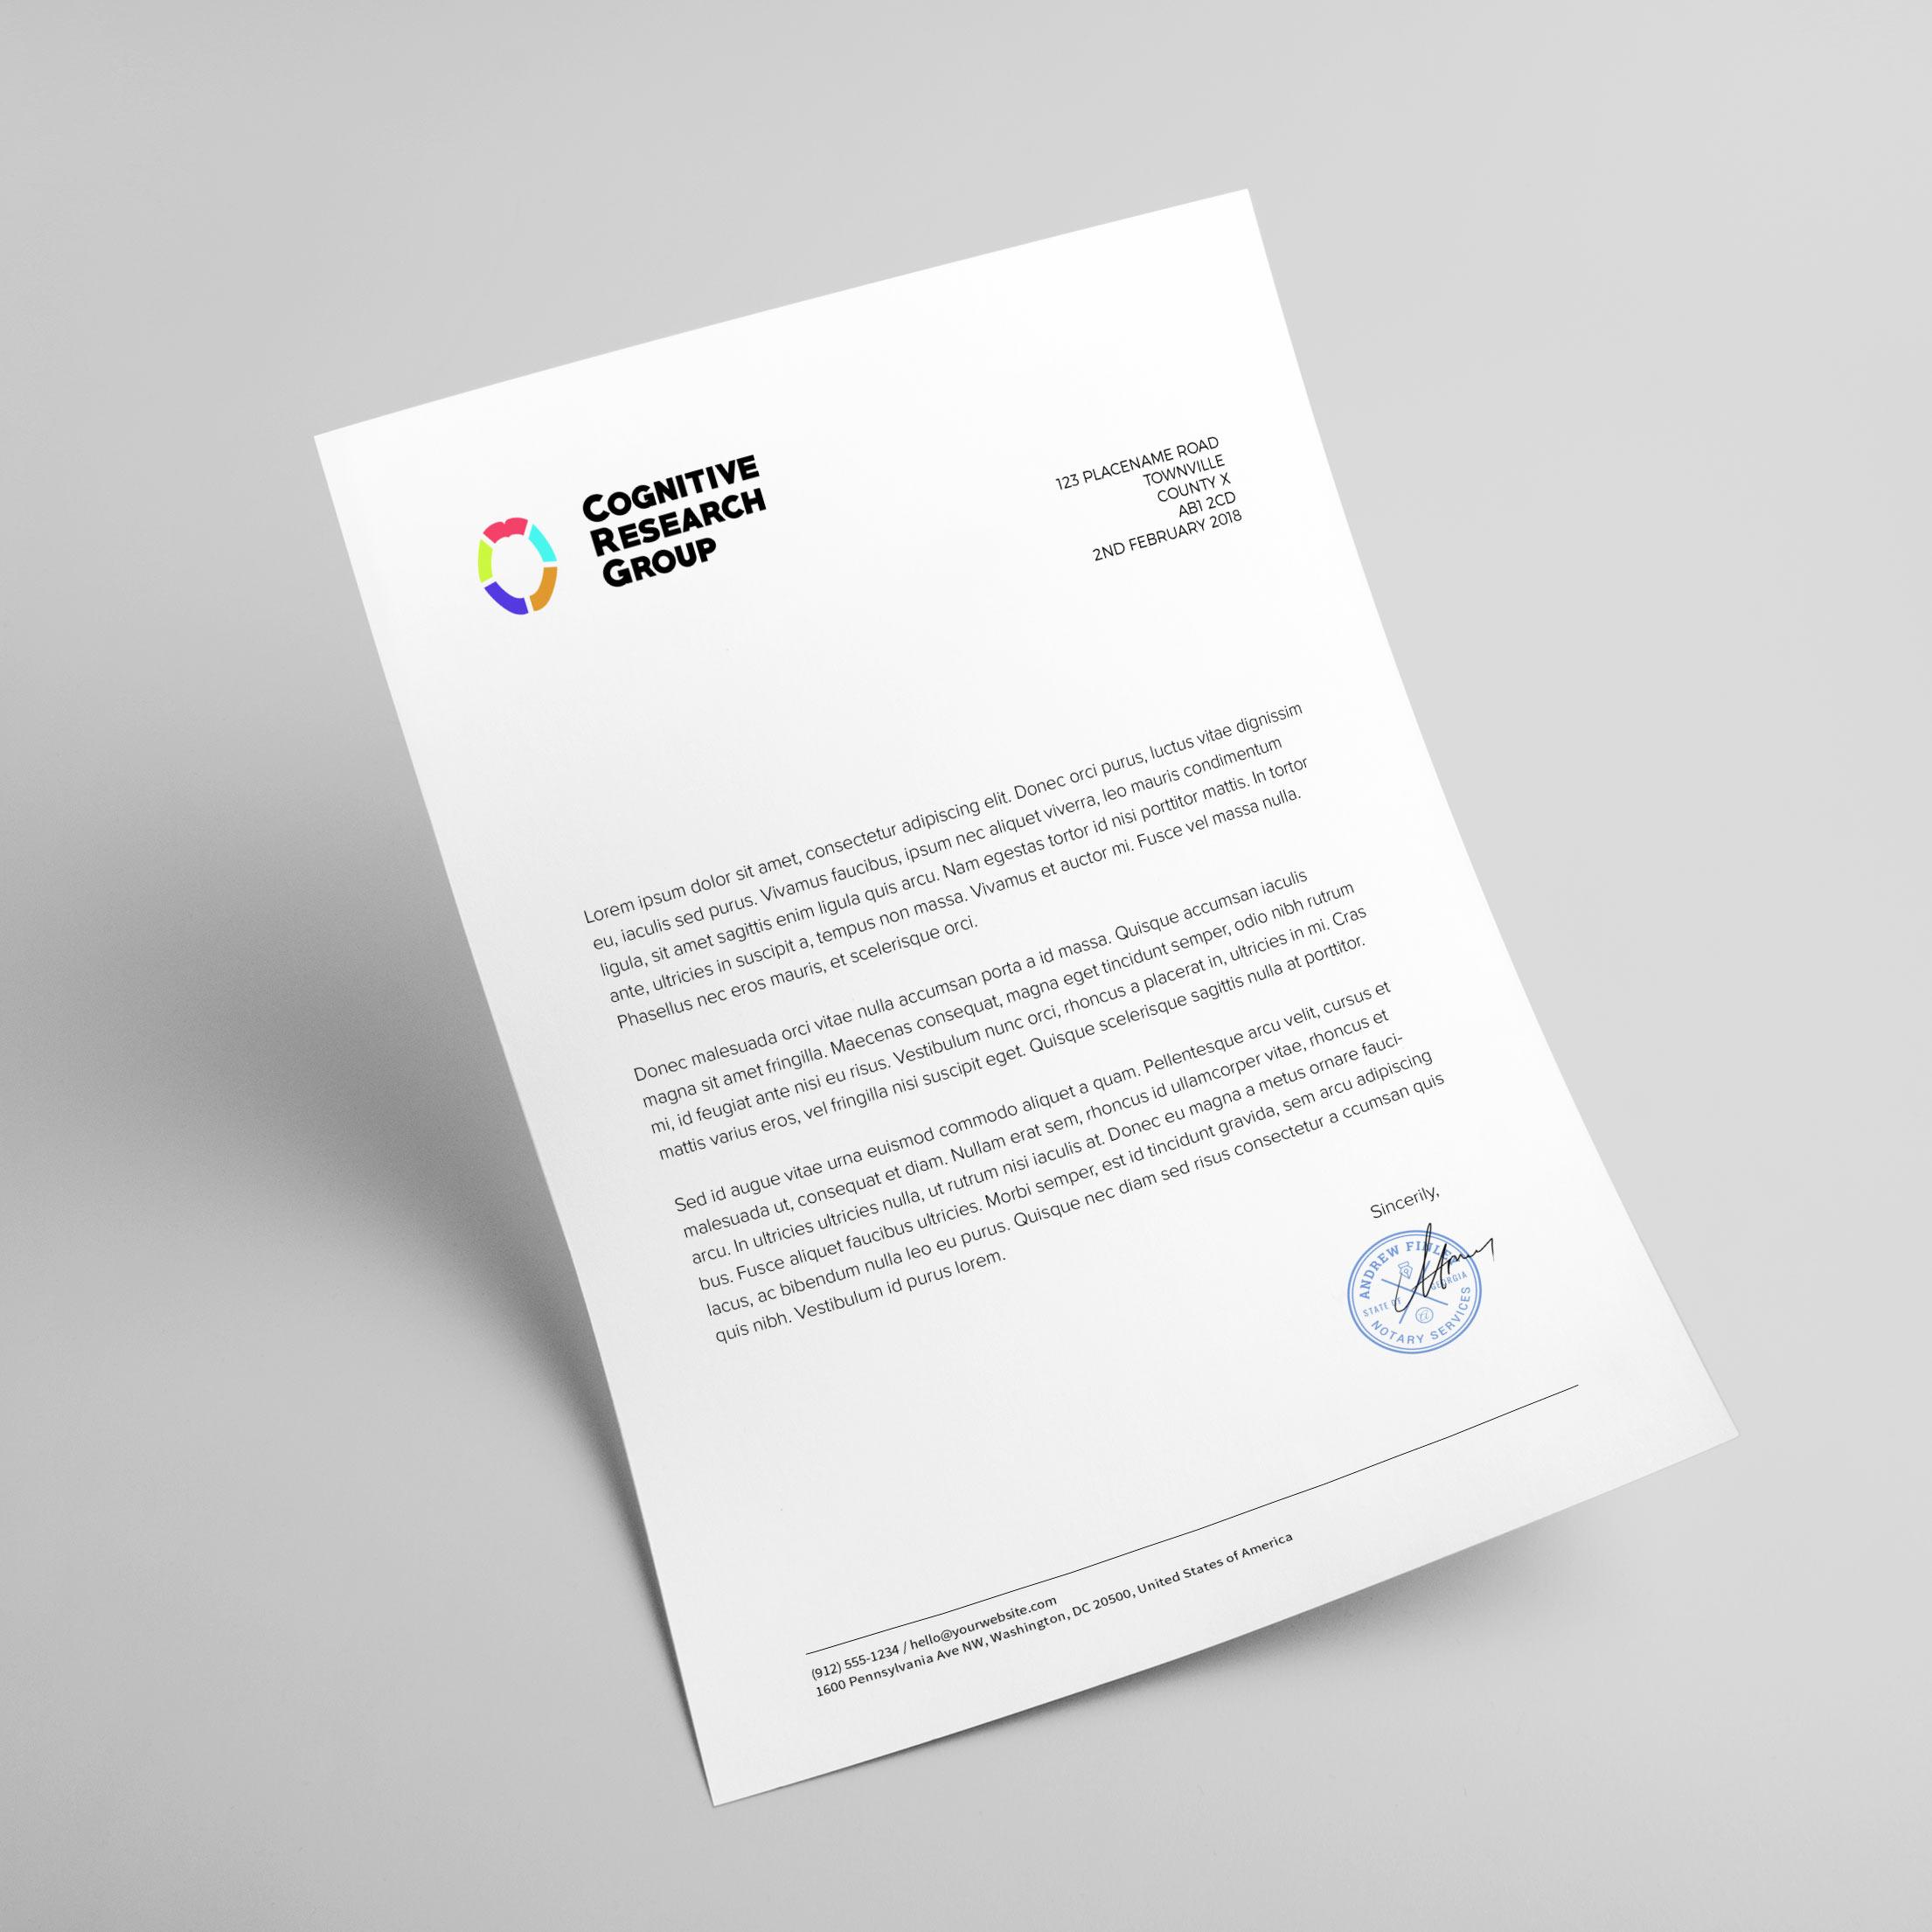 THAT Branding Company - Ethical Branding Creative Agency based in Newcastle Gateshead and Durham - CoRe Letterhead.jpg